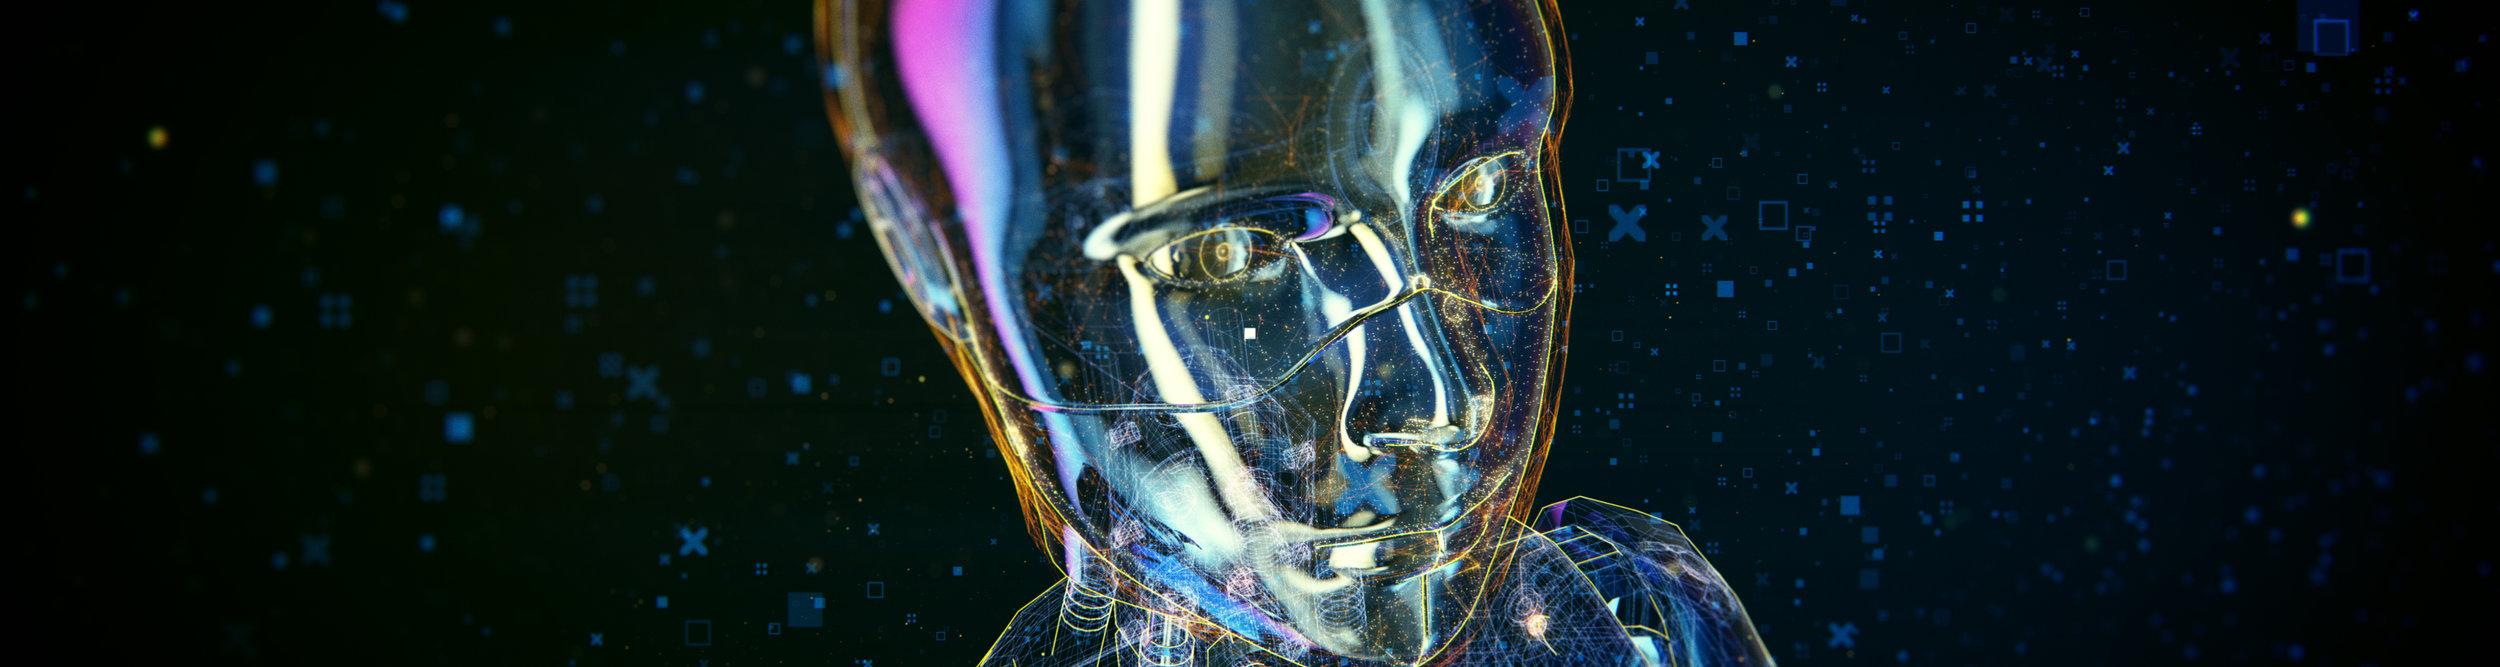 171113_cyborg_v1_cam4_v2.jpg